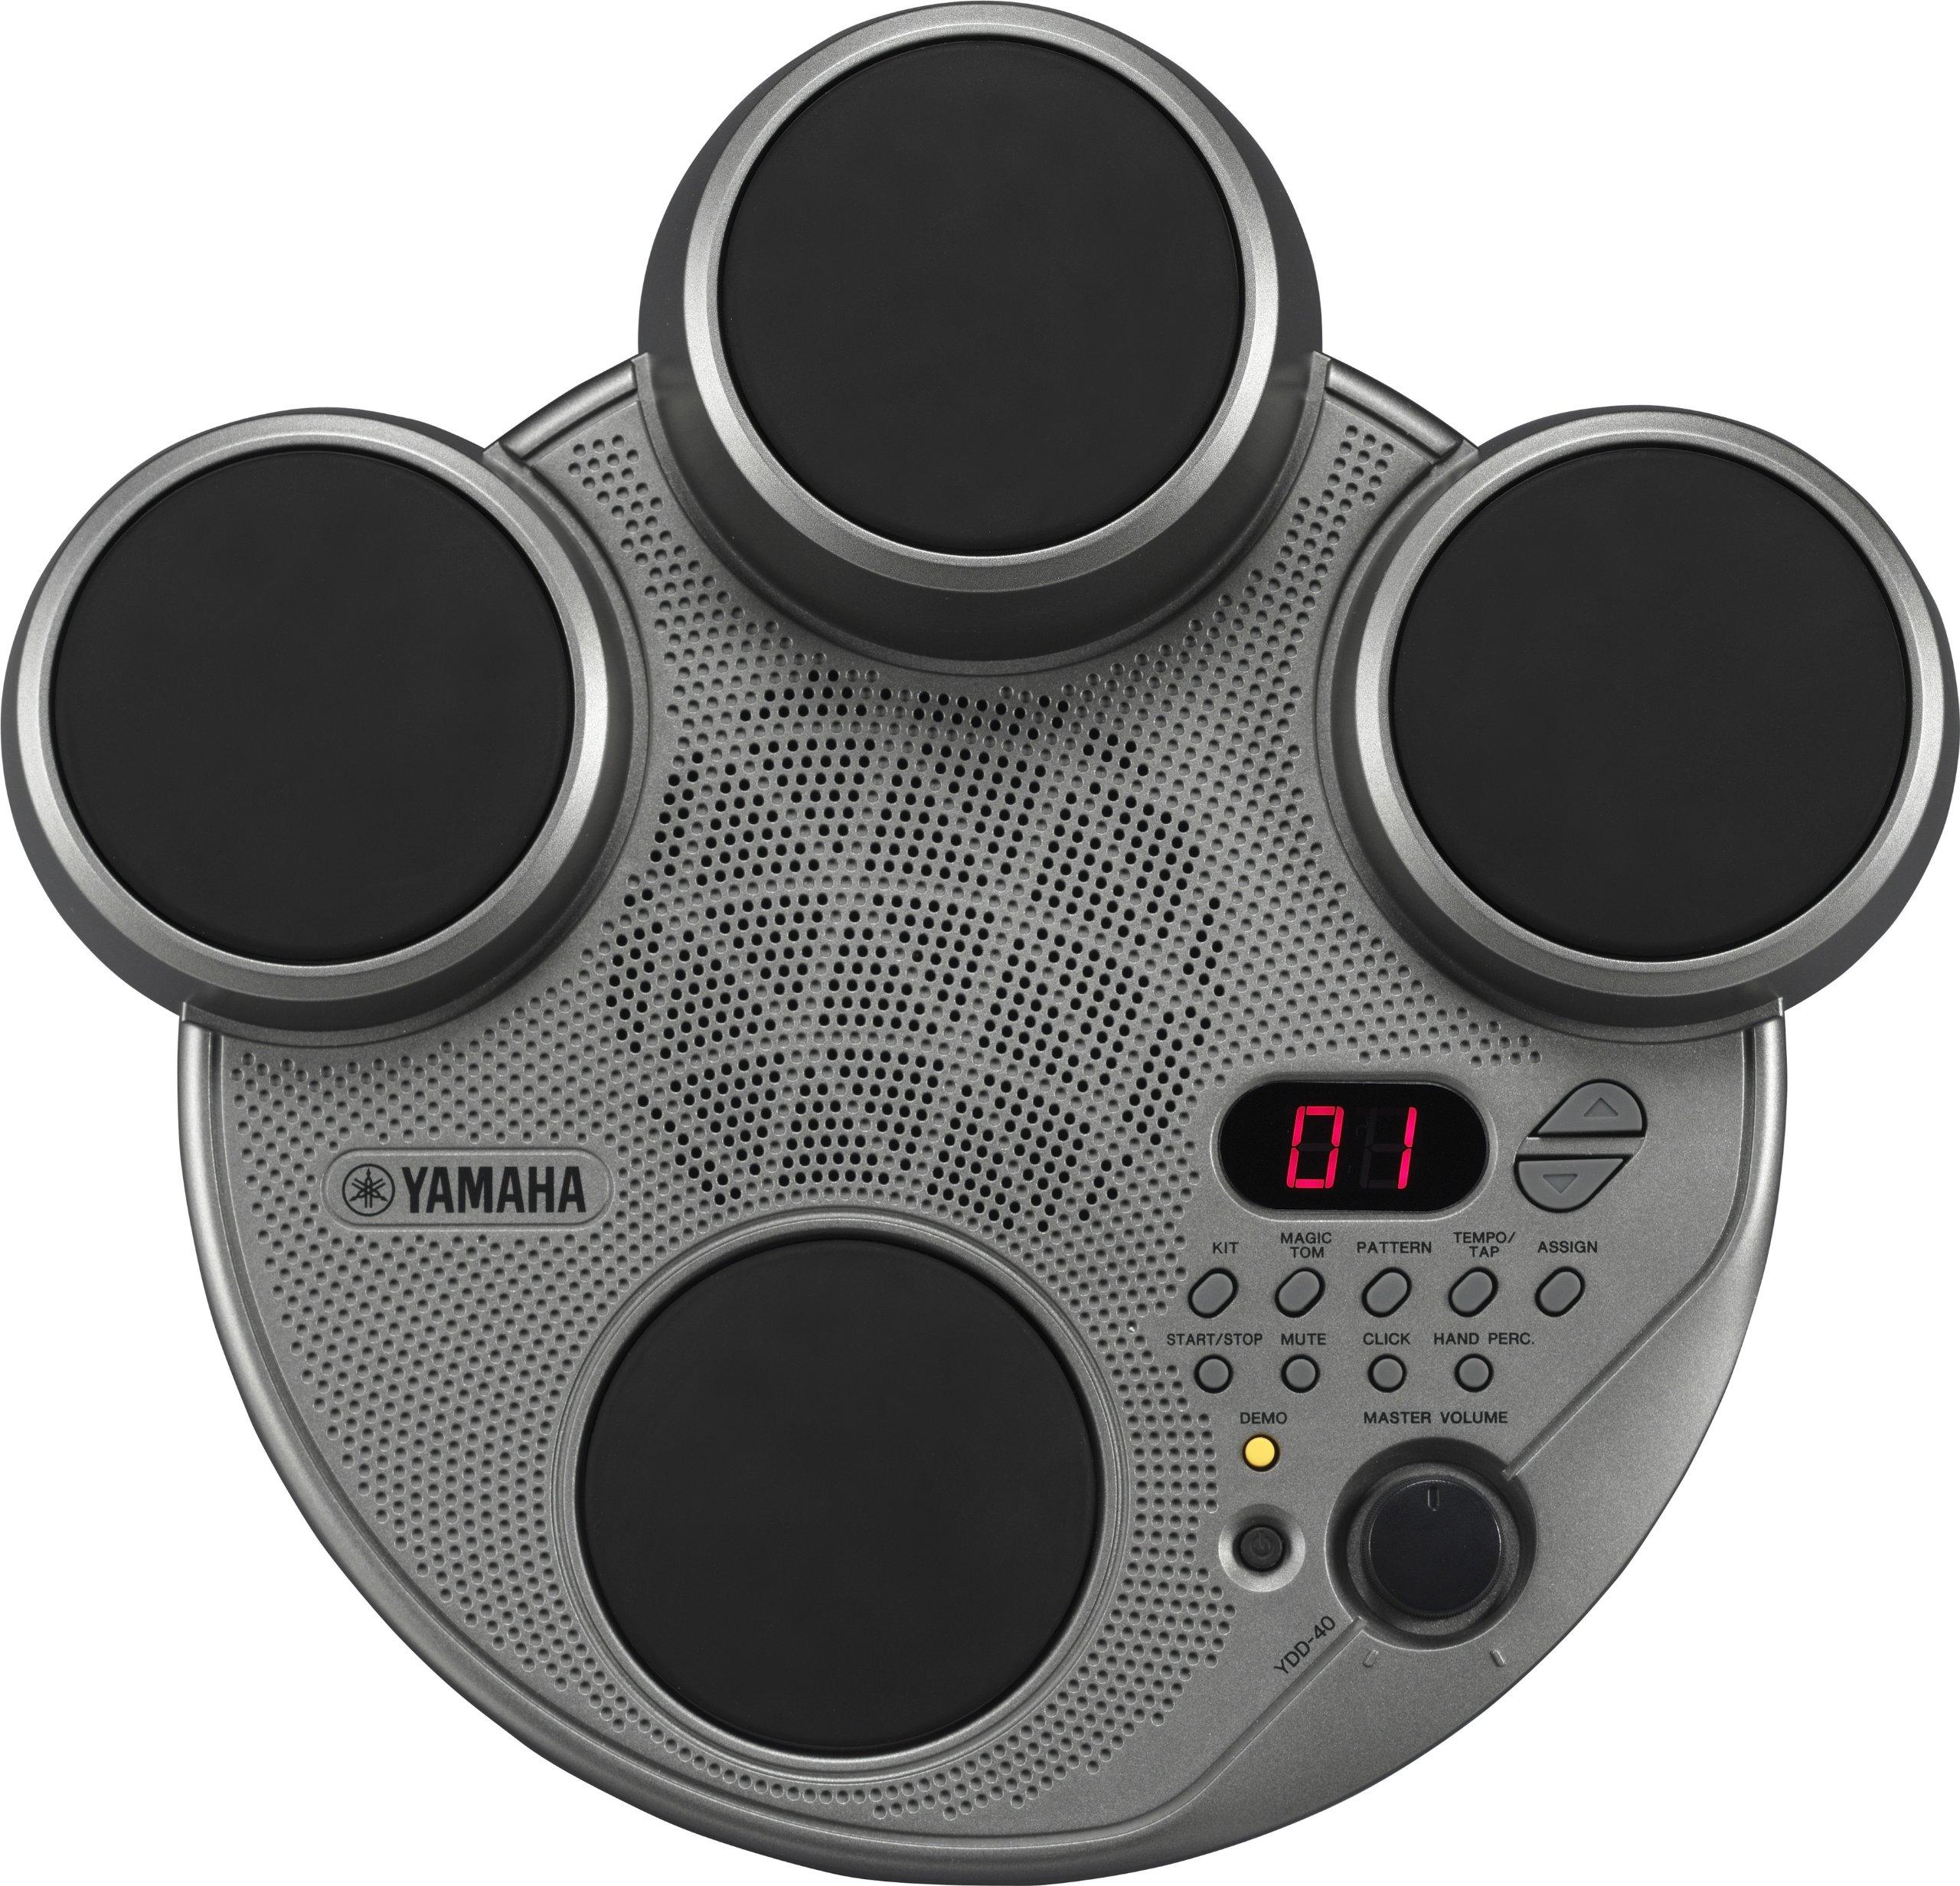 Yamaha YDD40 Portable Digital Electronic Drums